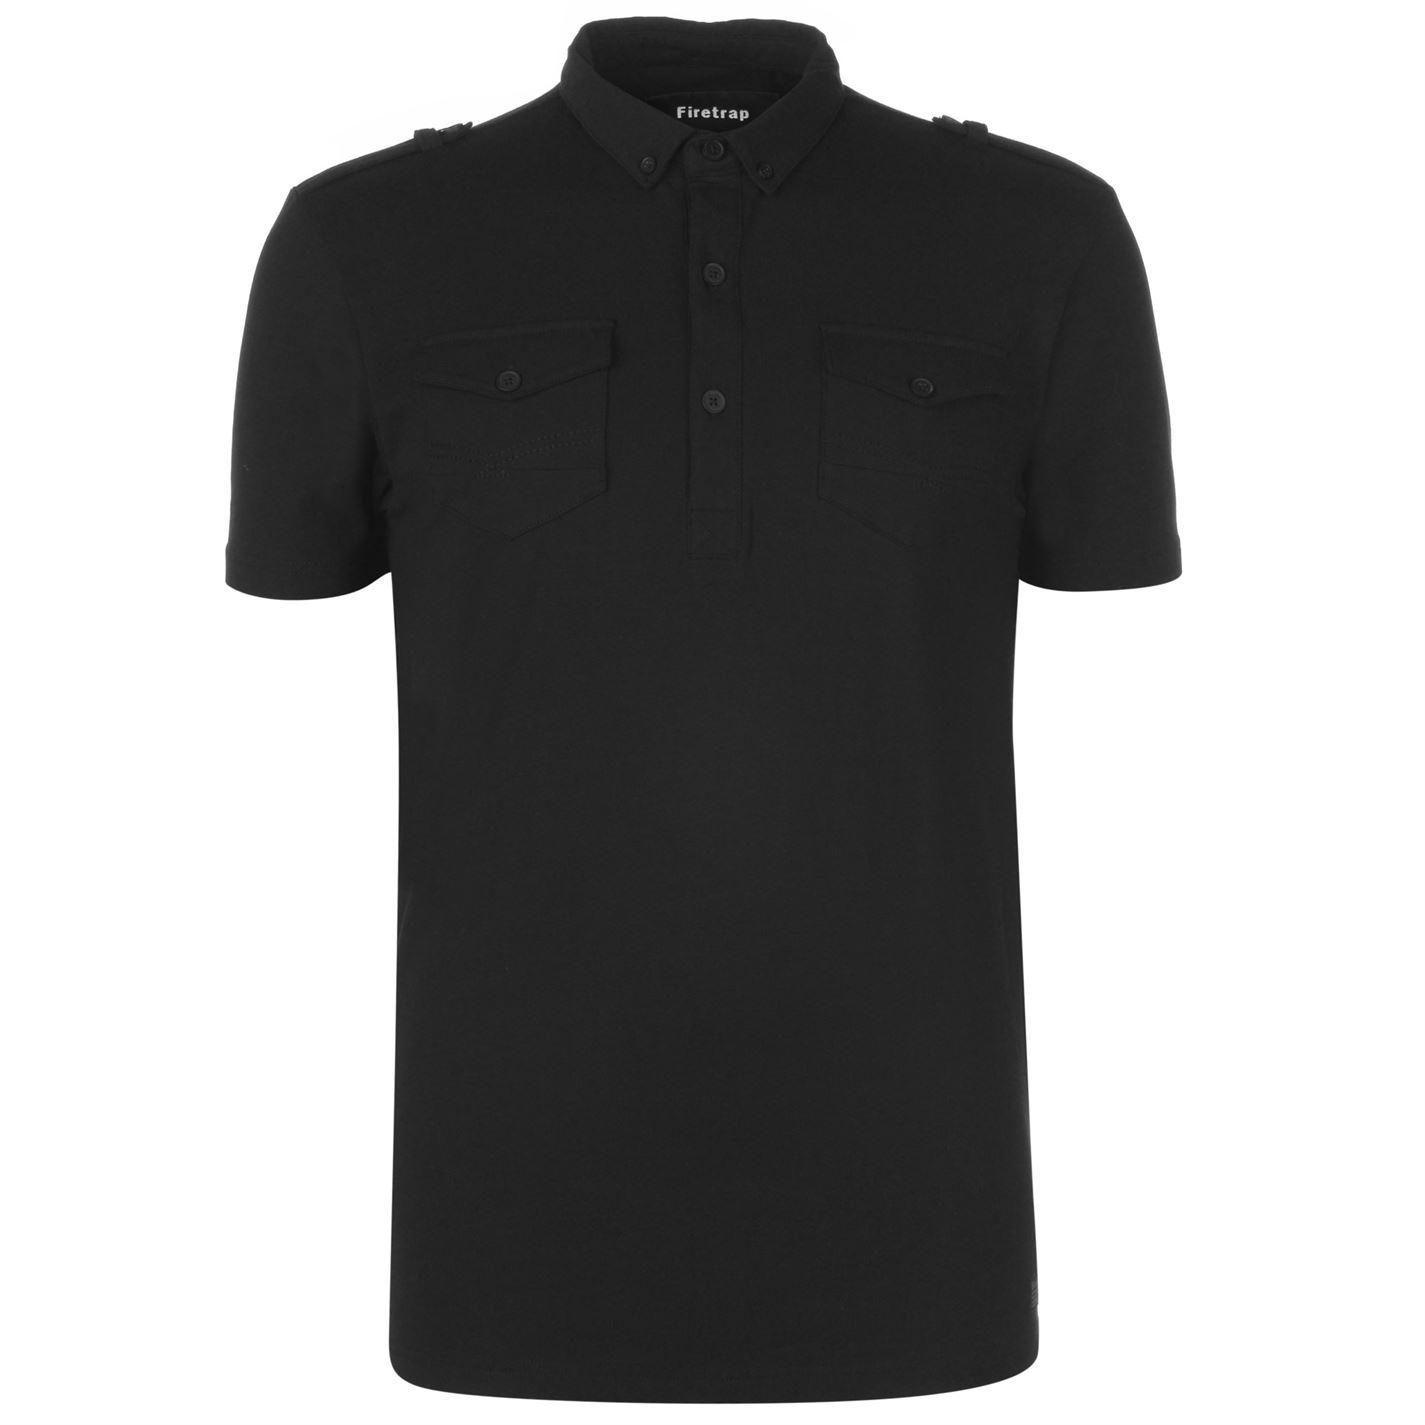 thumbnail 3 - Firetrap-Double-Pocket-Polo-Shirt-Mens-Collar-Top-Tee-Black-Medium